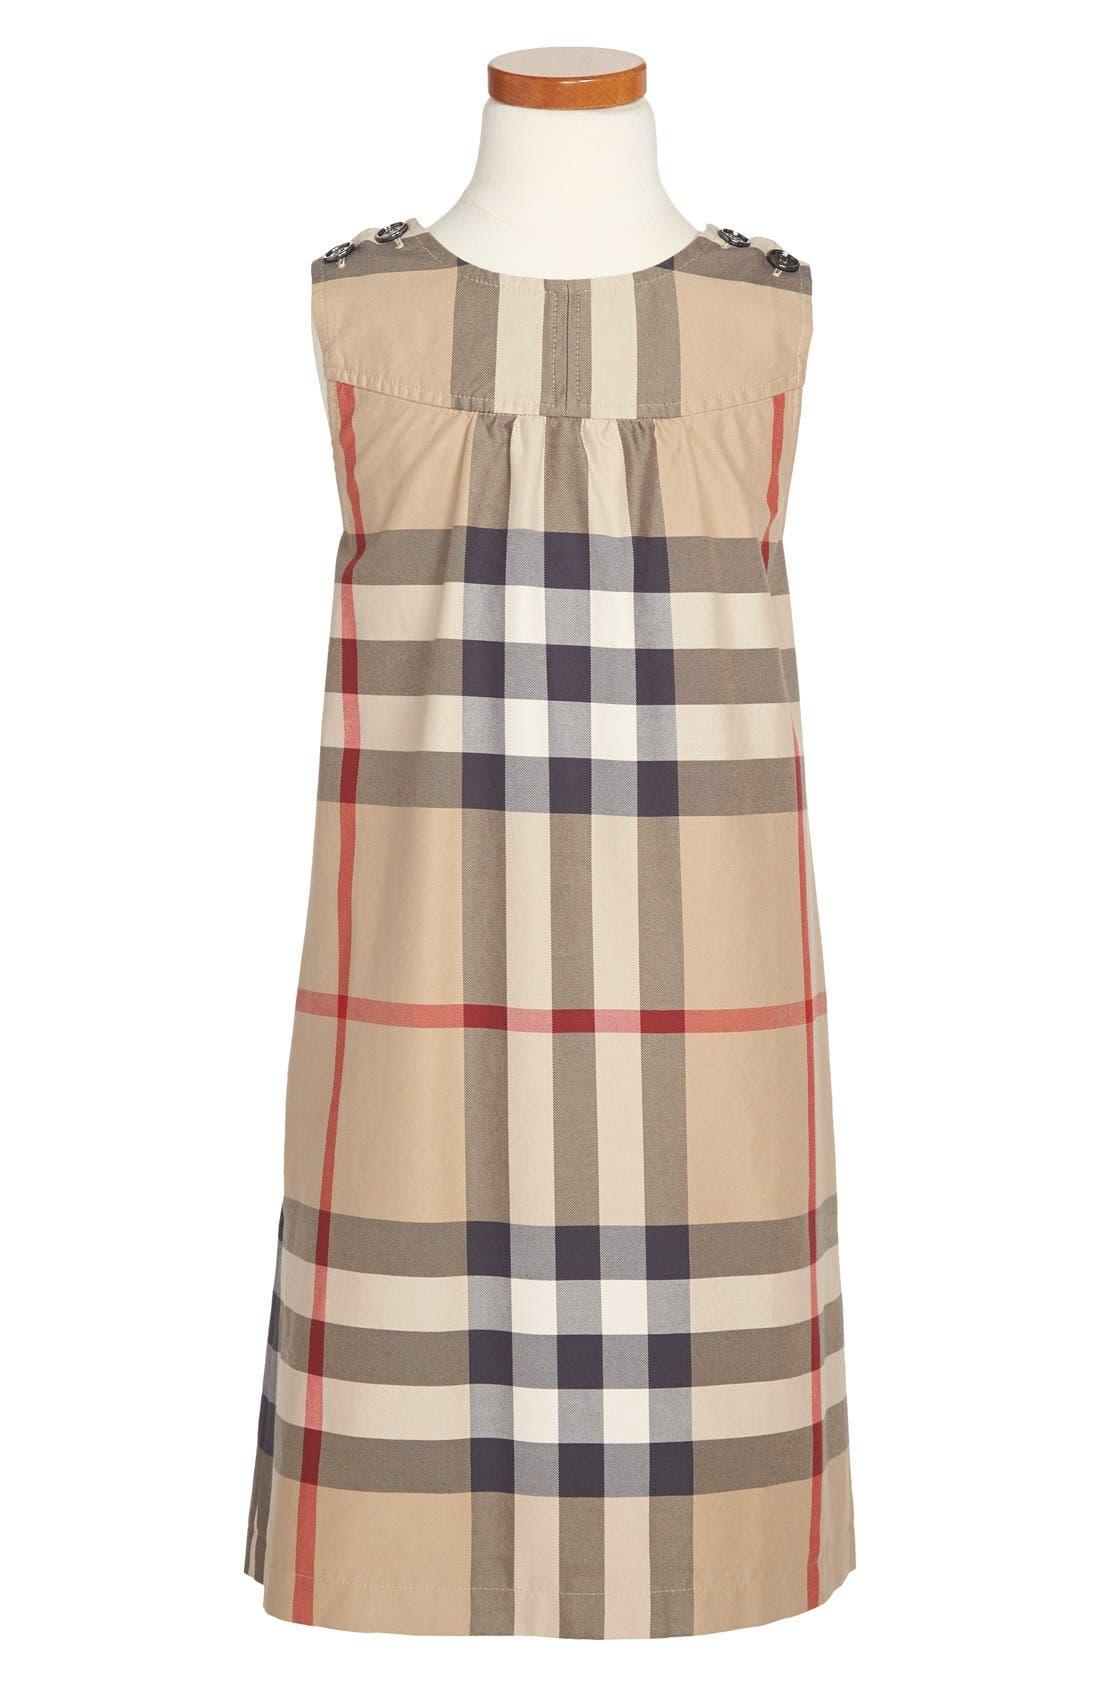 Alternate Image 1 Selected - Burberry Check Print Dress (Little Girls & Big Girls)